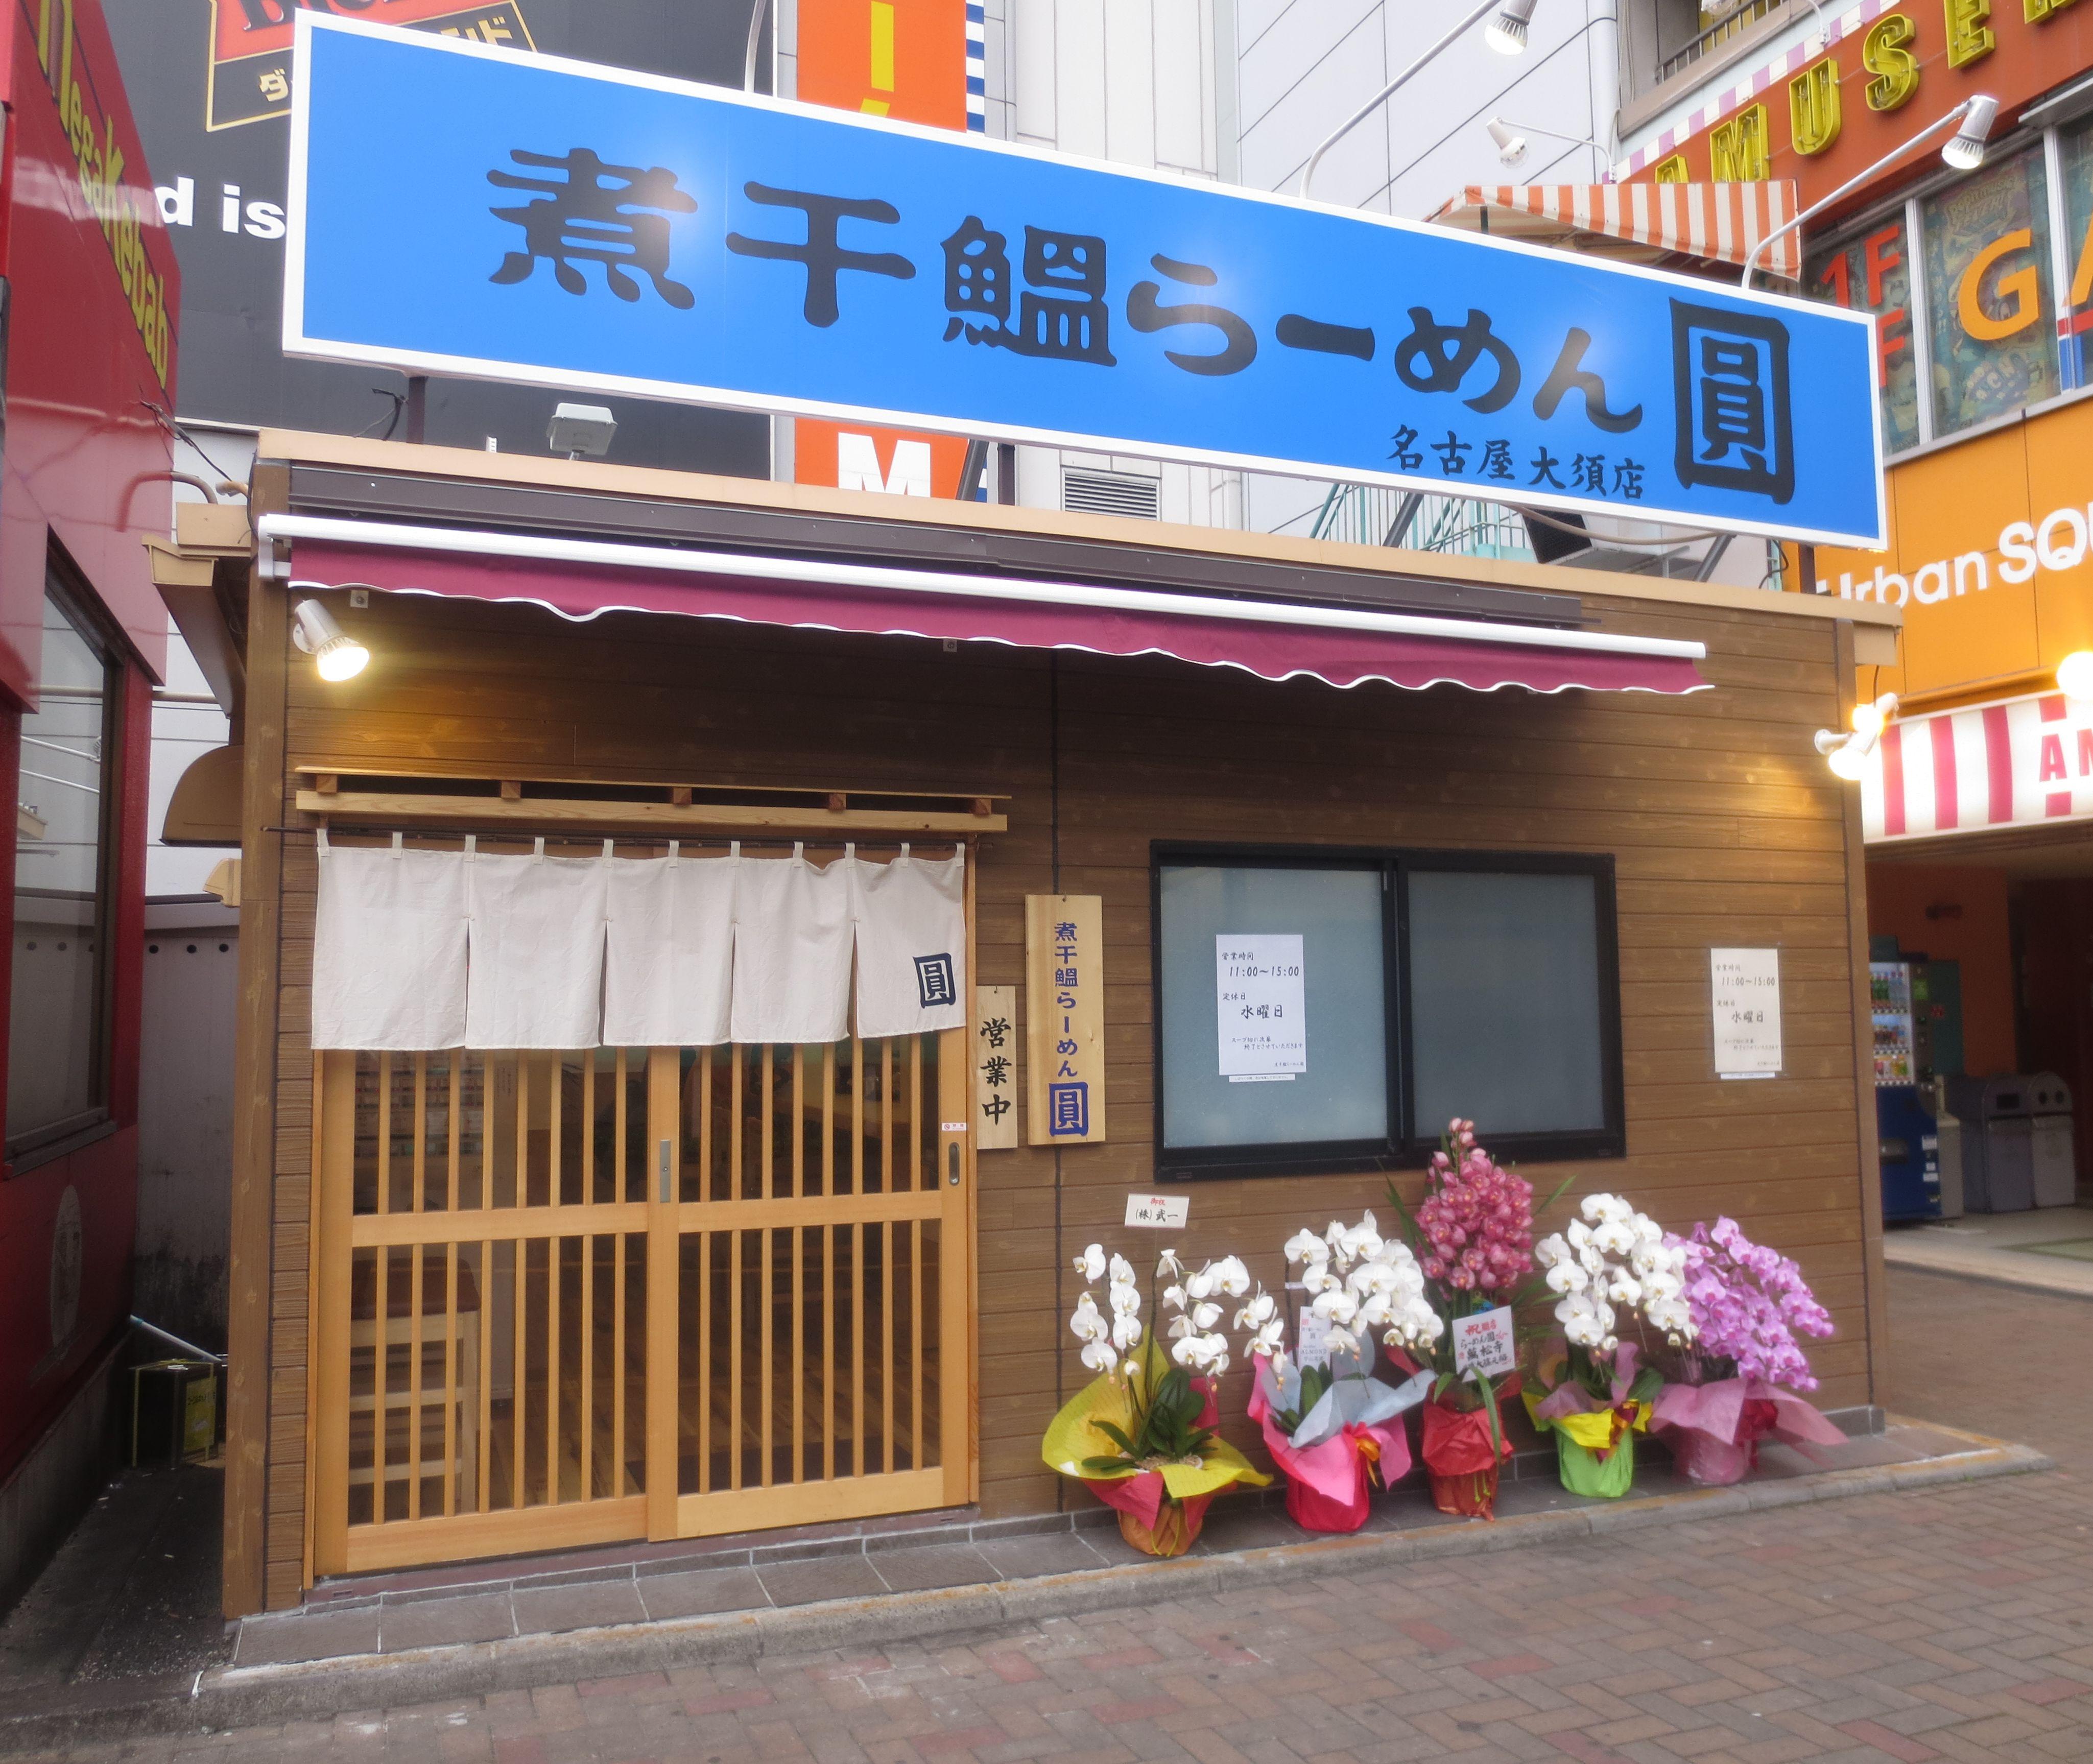 煮干鰮らーめん 圓 名古屋大須店【新店】(名古屋市中区)